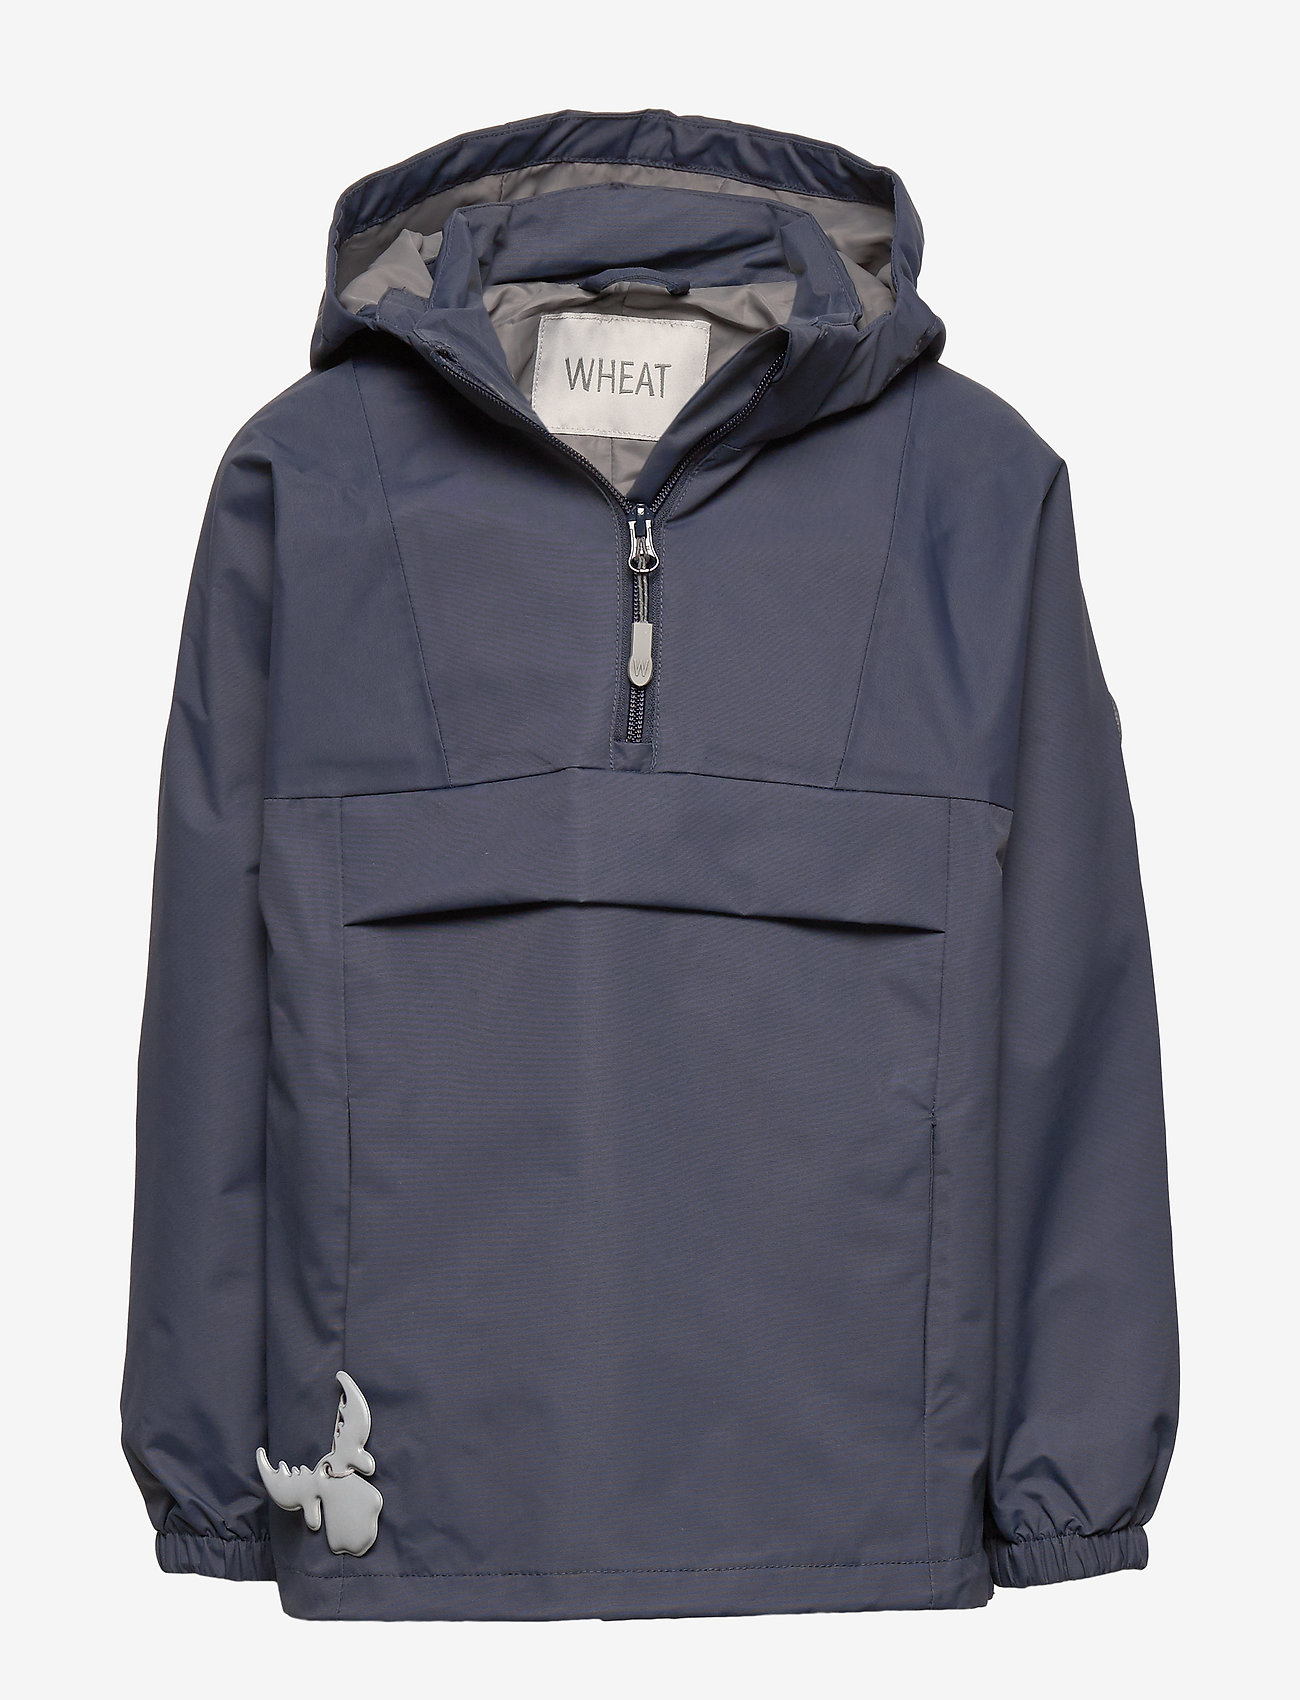 Wheat - Jacket Ziggy - shell jacket - ink - 0